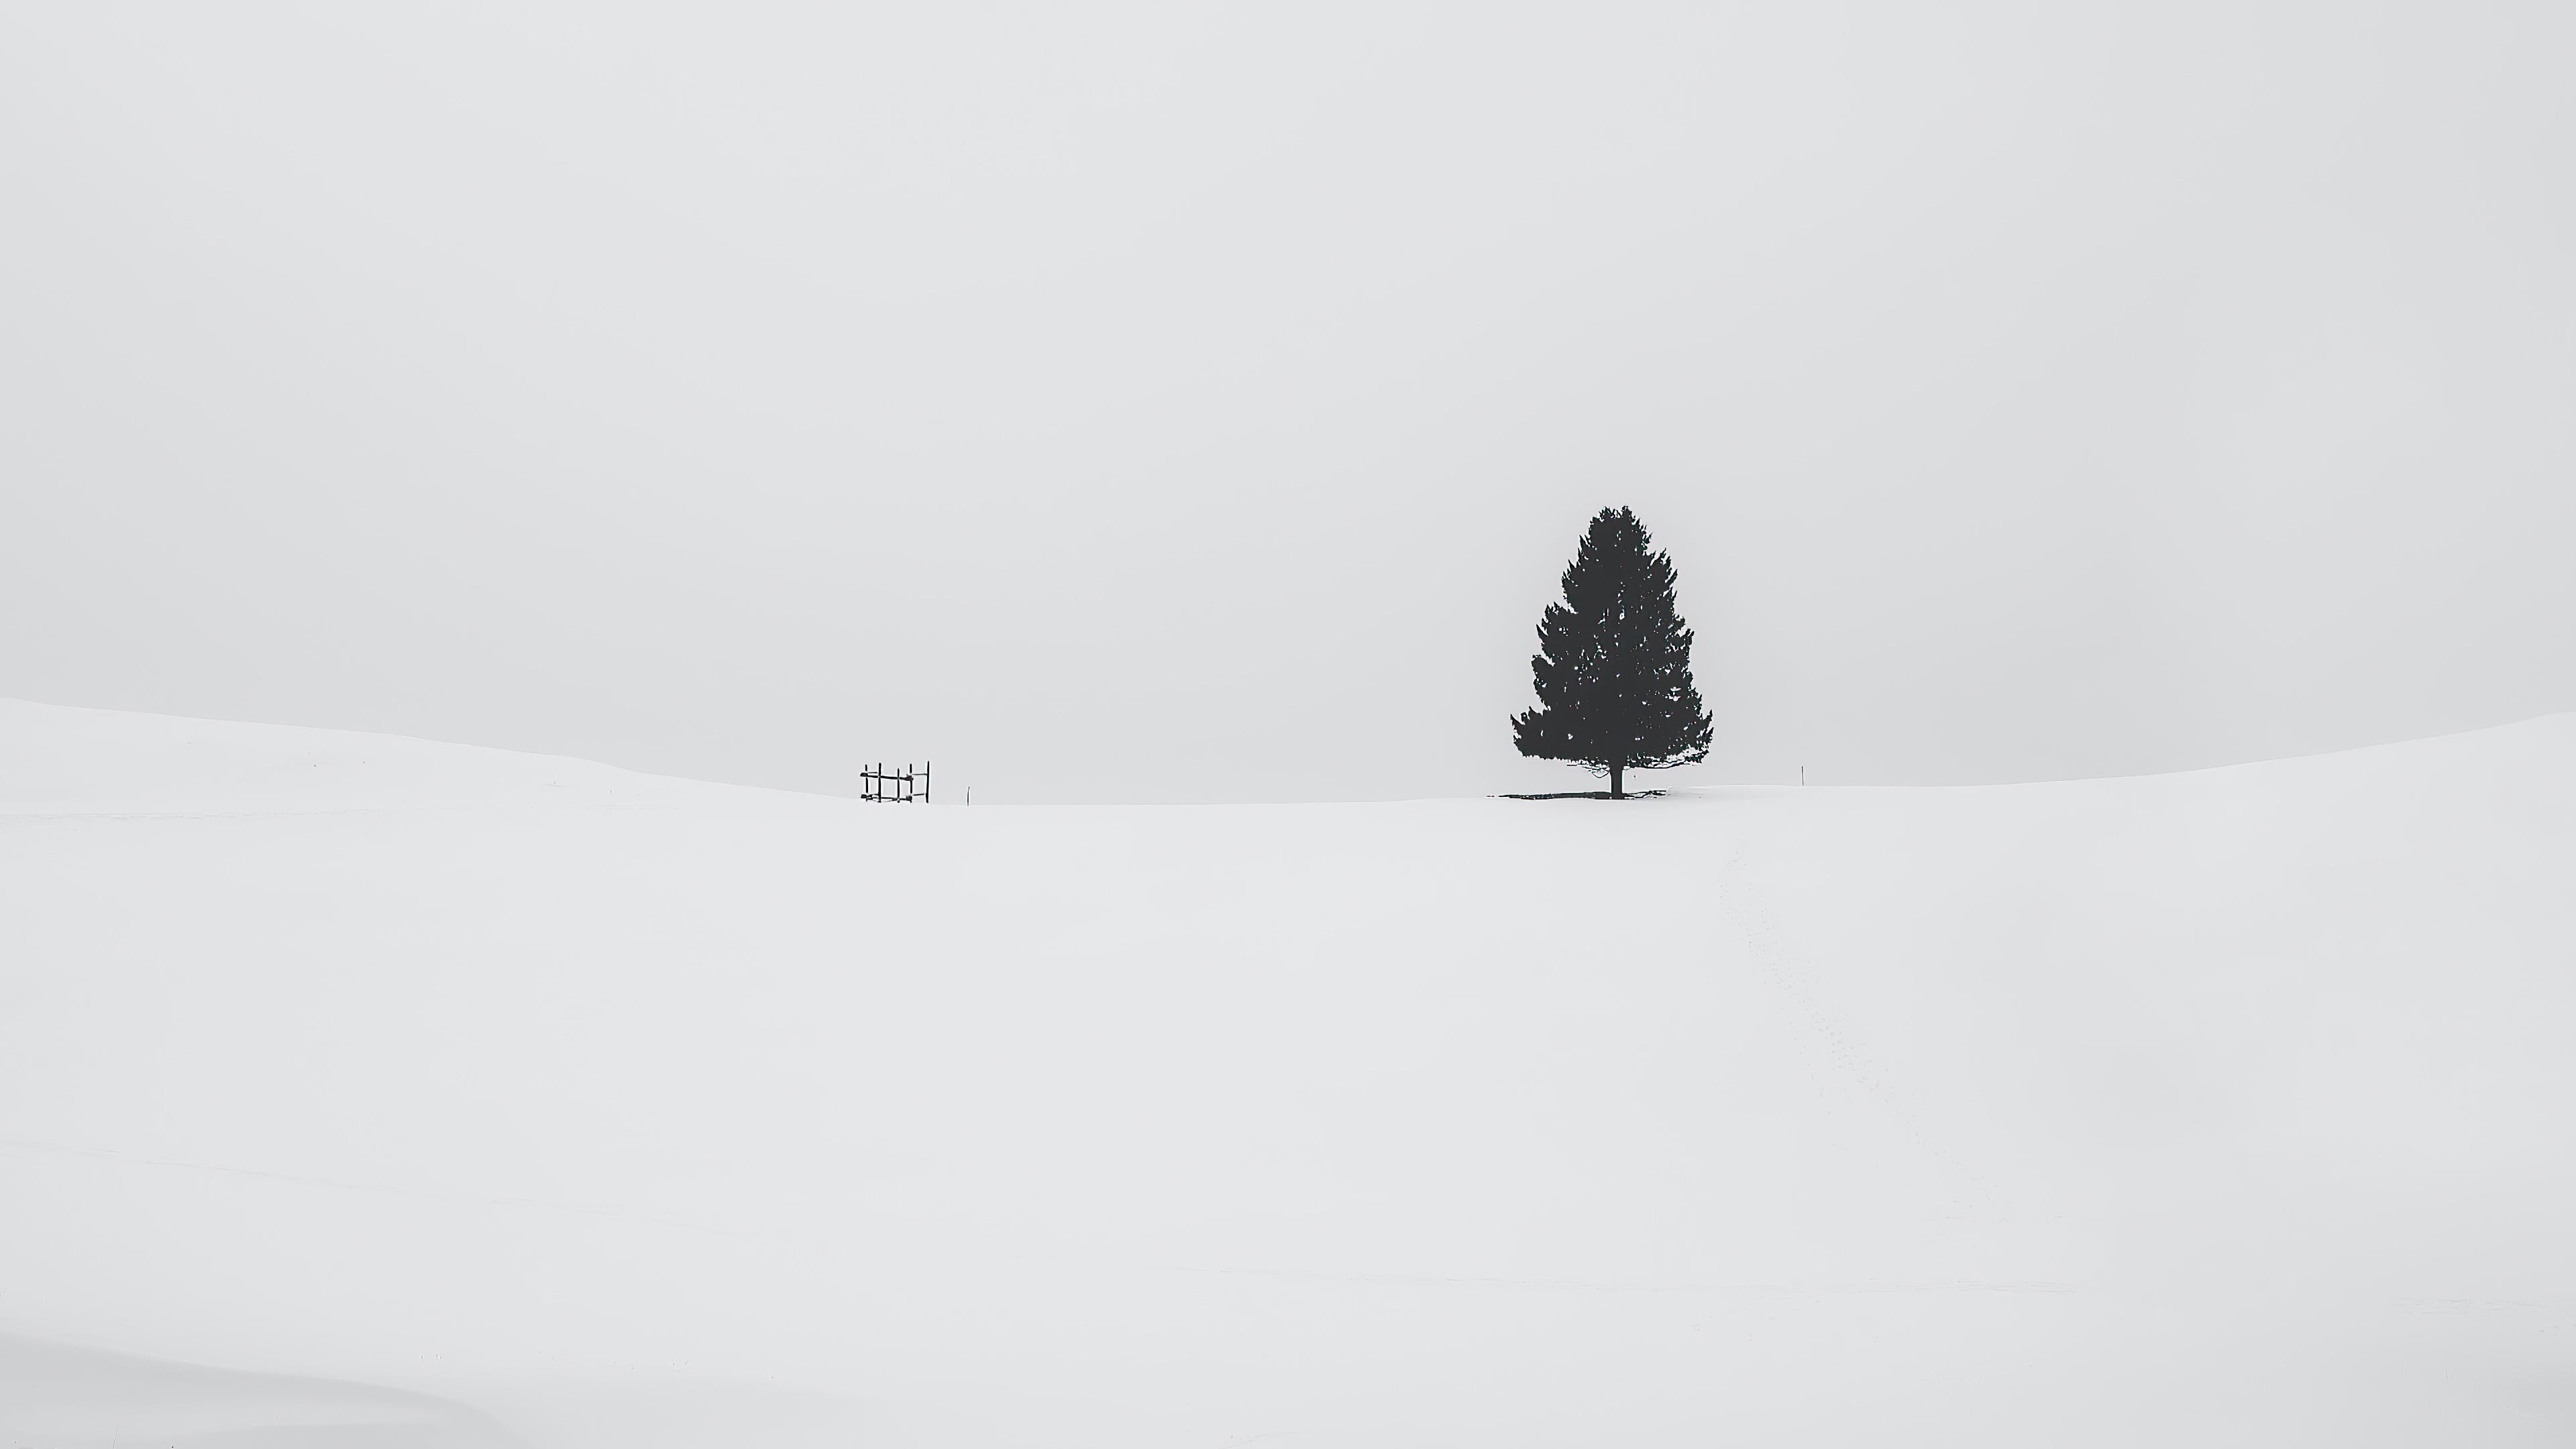 tree snow 4k 1615197744 - Tree Snow 4k - Tree Snow 4k wallpapers